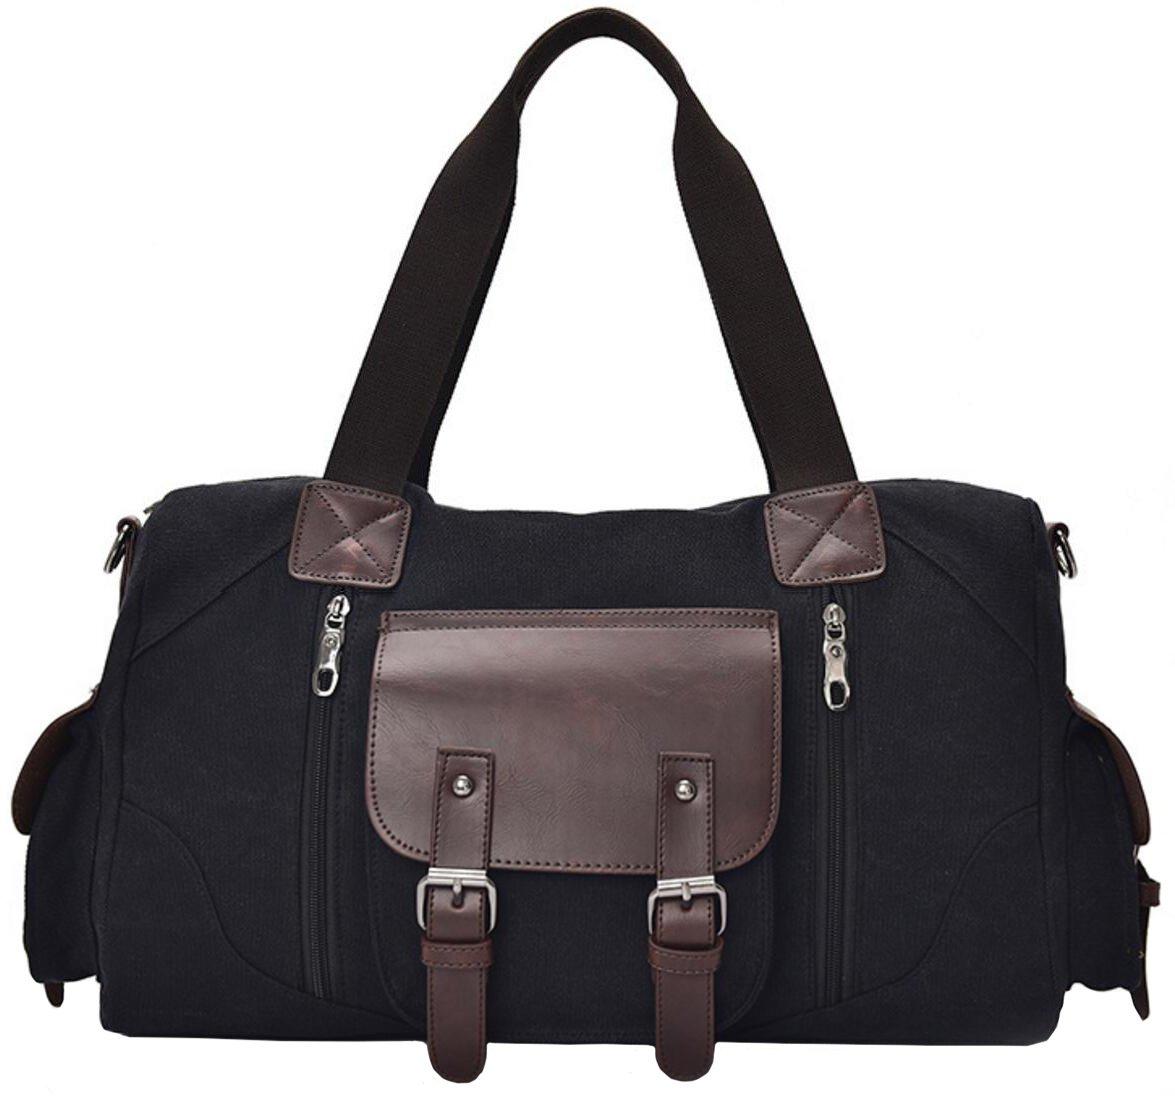 OrrinSports Travel Duffel Bag Canvas Shoulder Luggage Bag for Weekend Business Trip Black